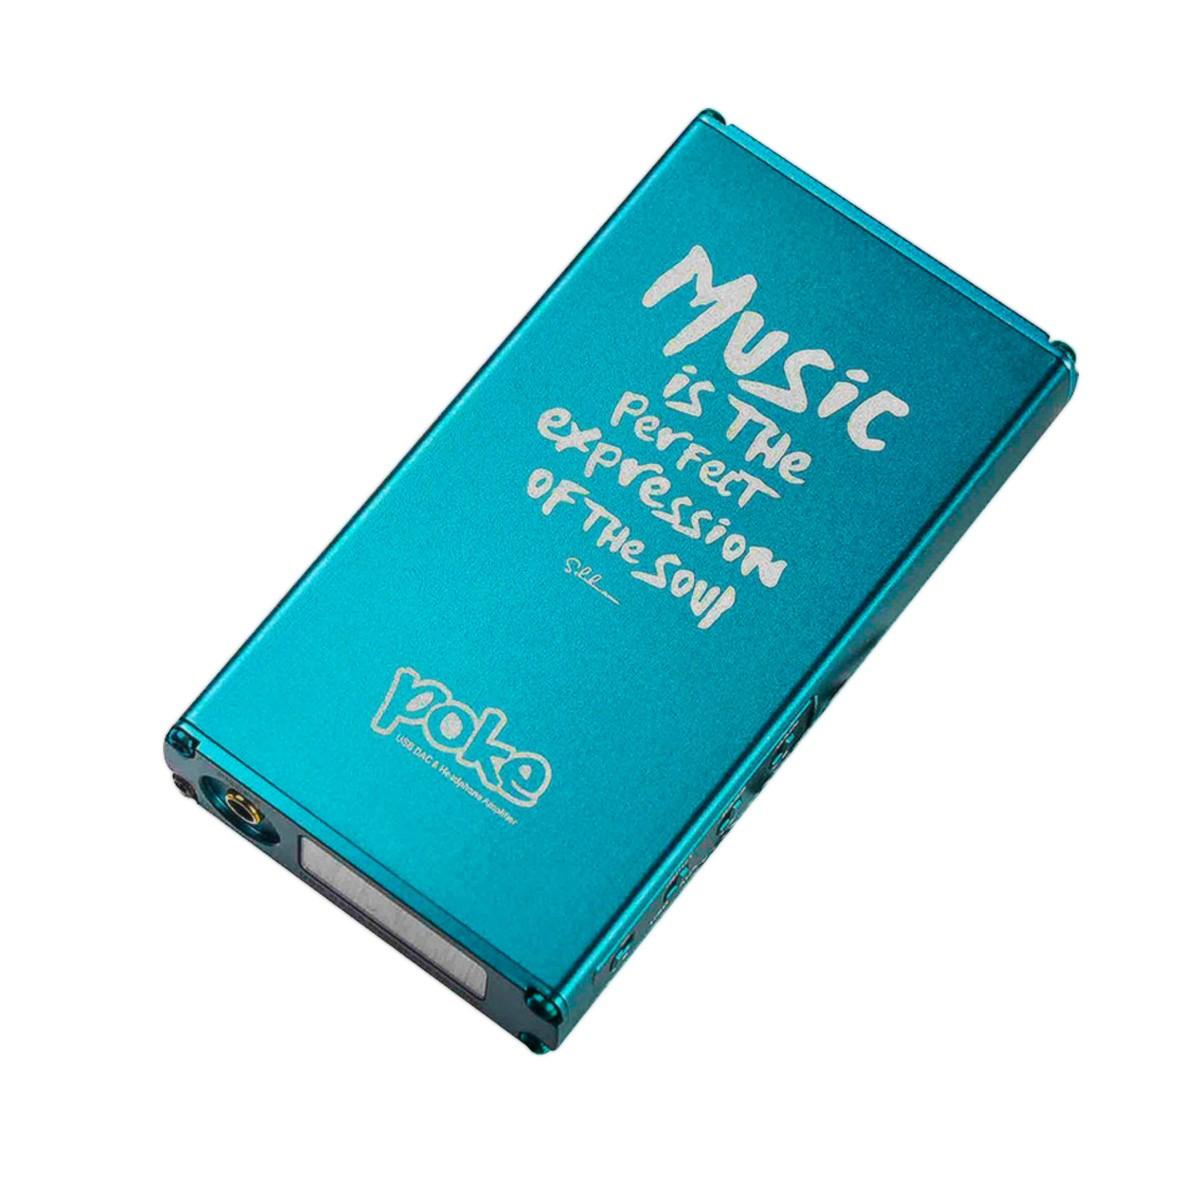 XDUOO XD-10 POKE Amplificateur et DAC Casque Nomade XMOS AK4490EQ 32bit 384kHz DSD256